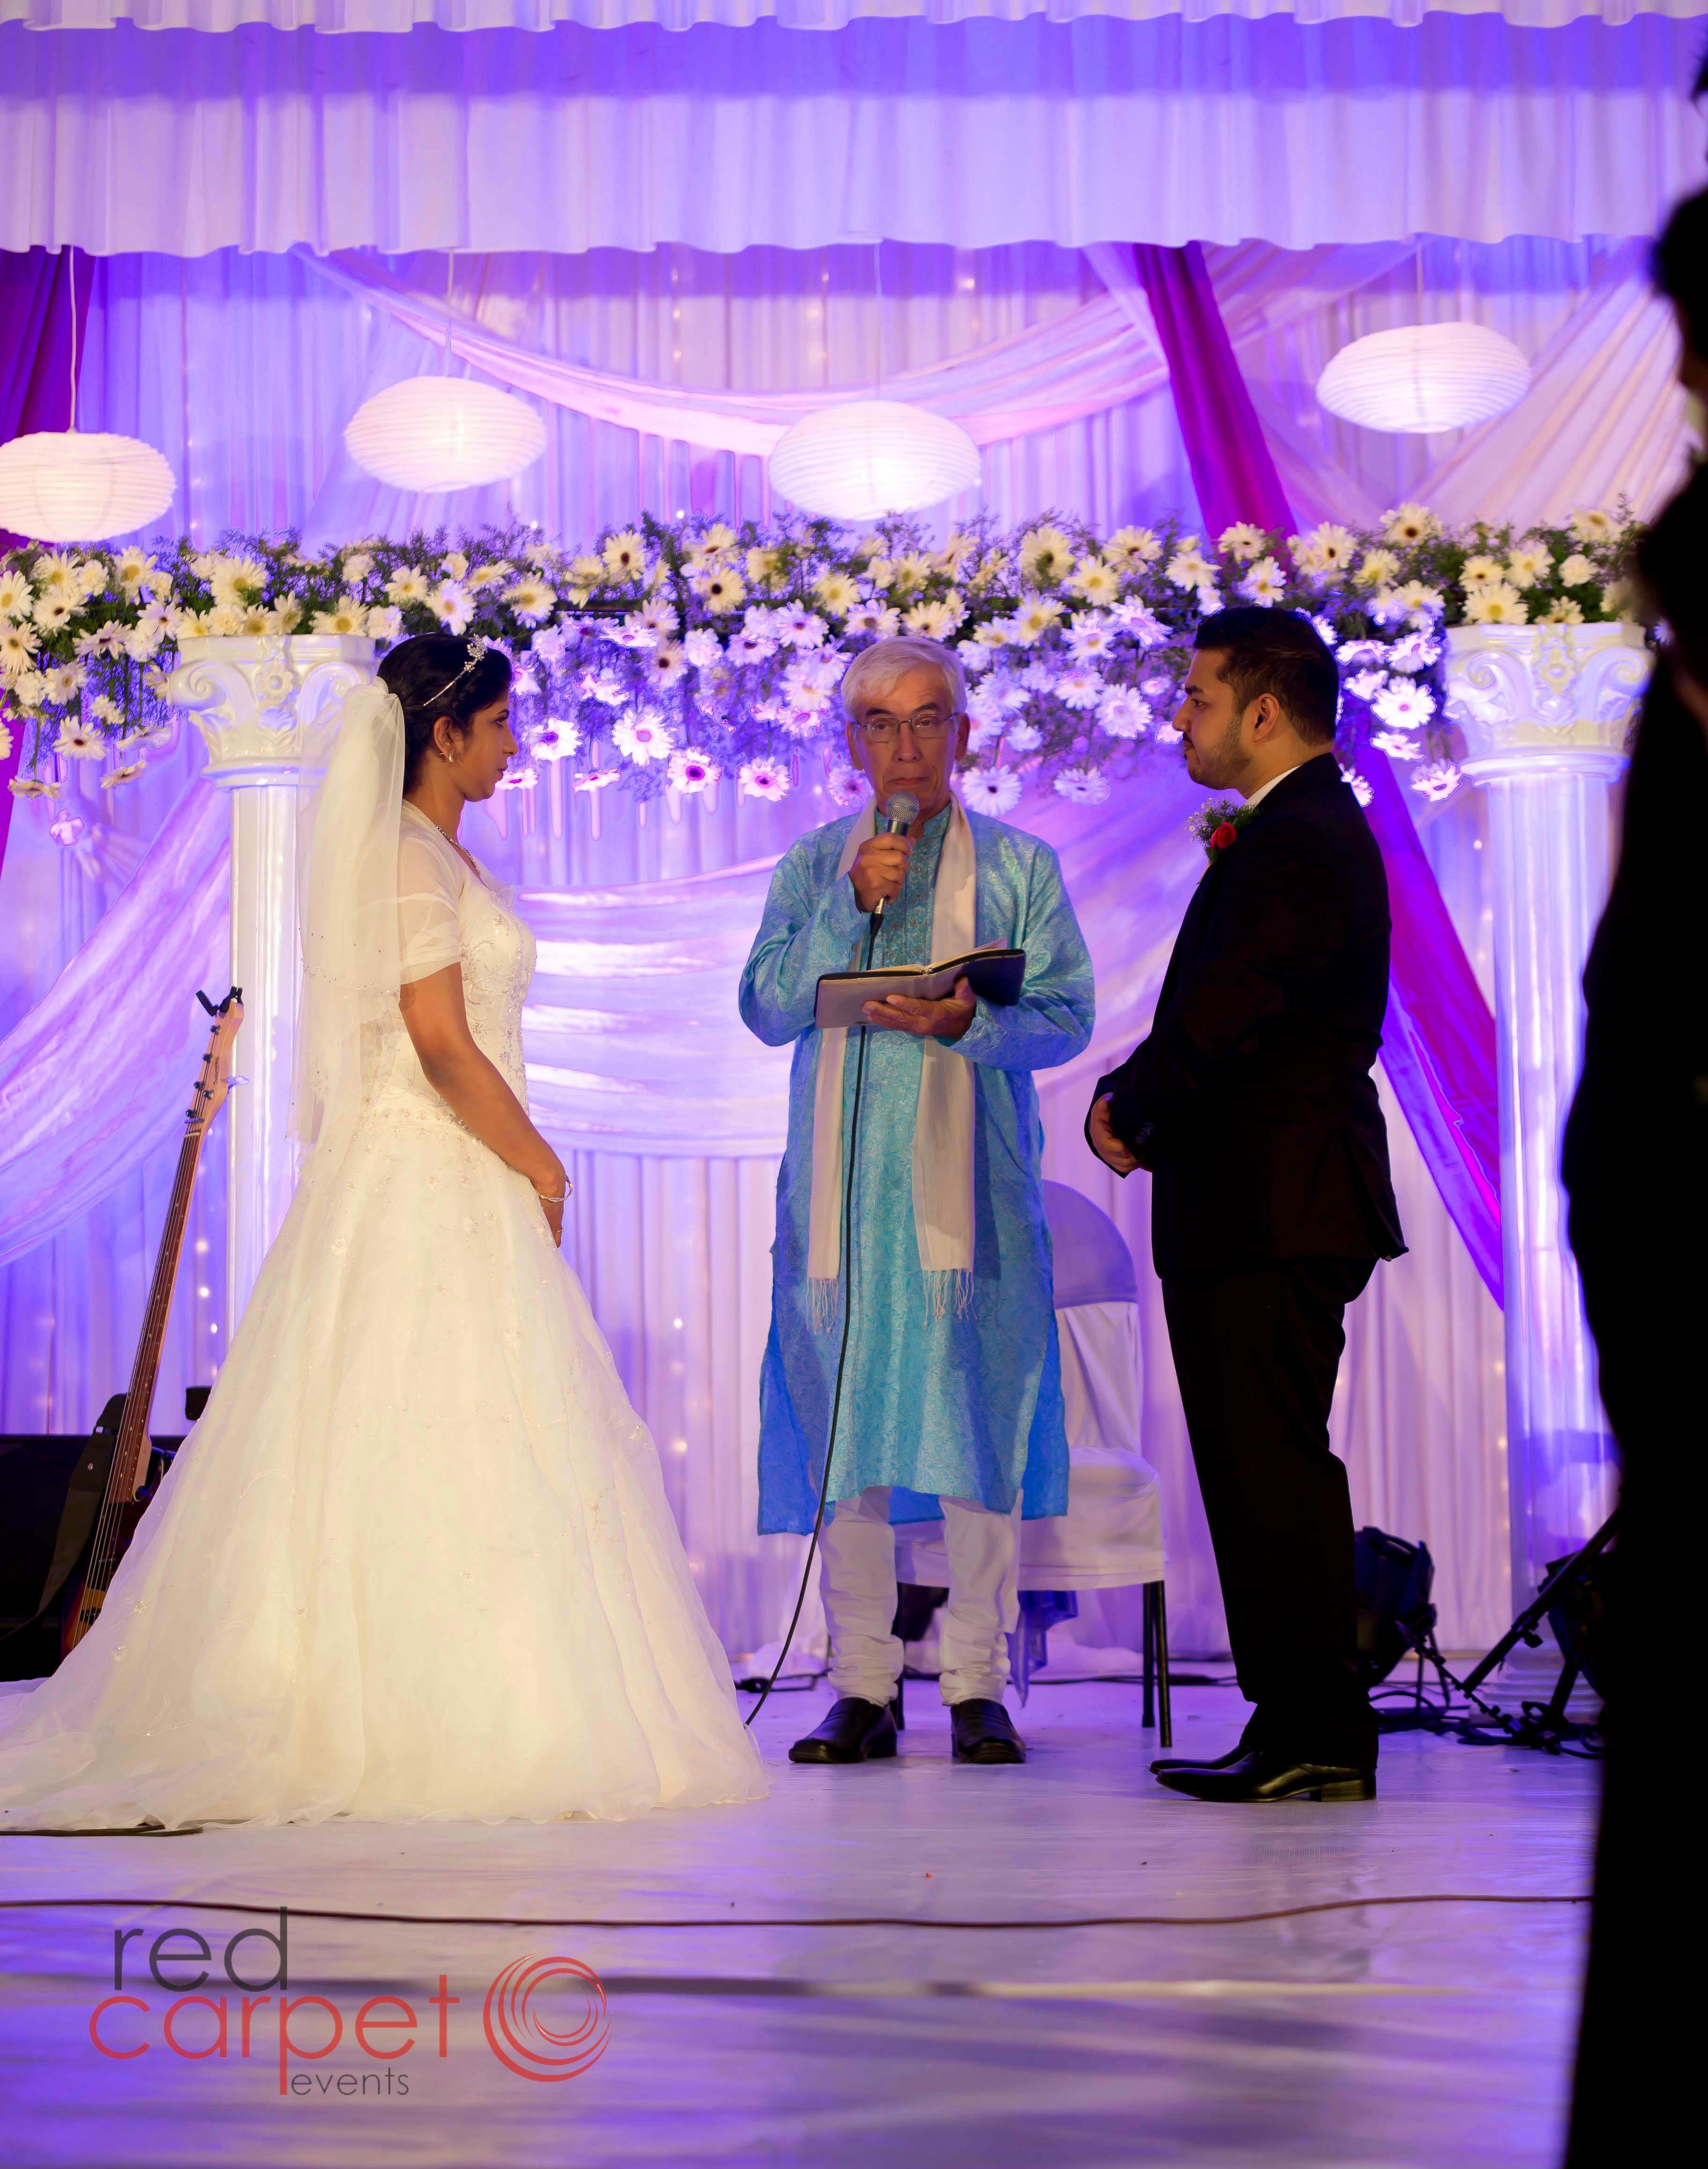 Christian Wedding Planner